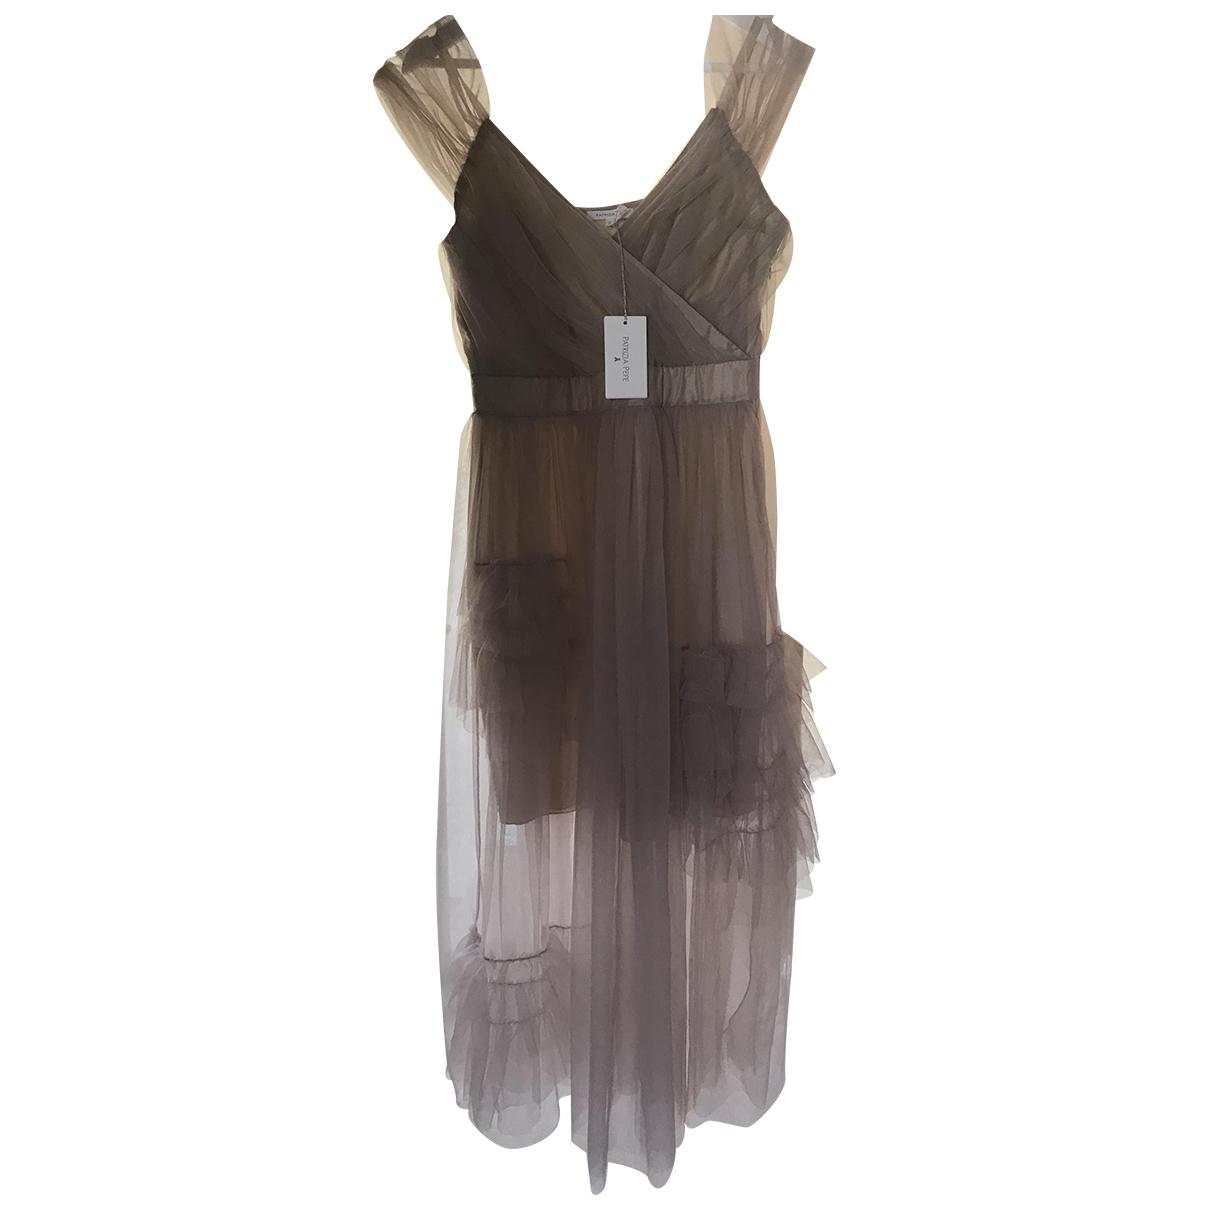 Patrizia Pepe \N Beige Silk dress for Women M International